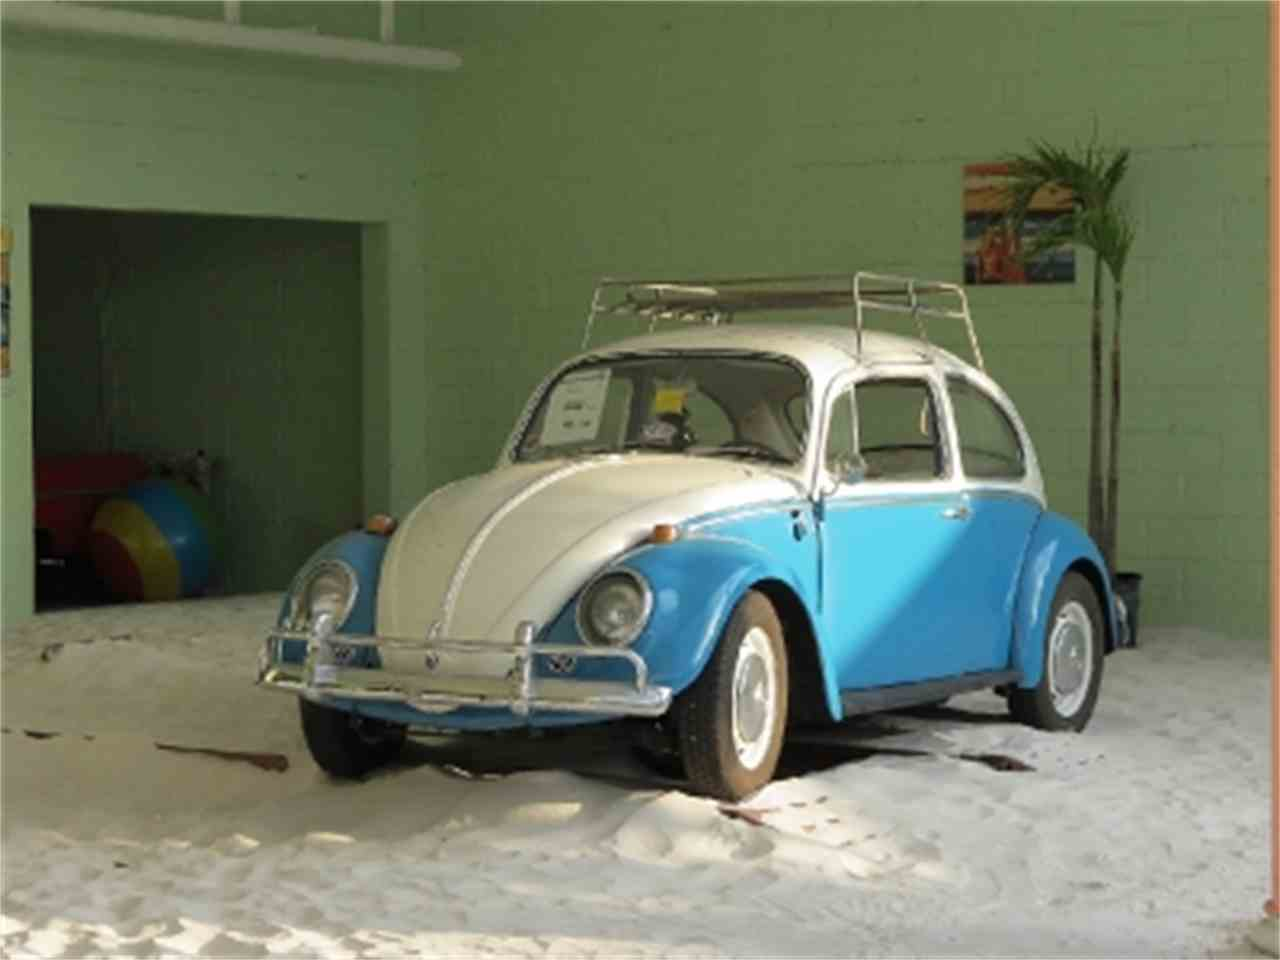 1966 Volkswagen Beetle for Sale | ClassicCars.com | CC-1013417